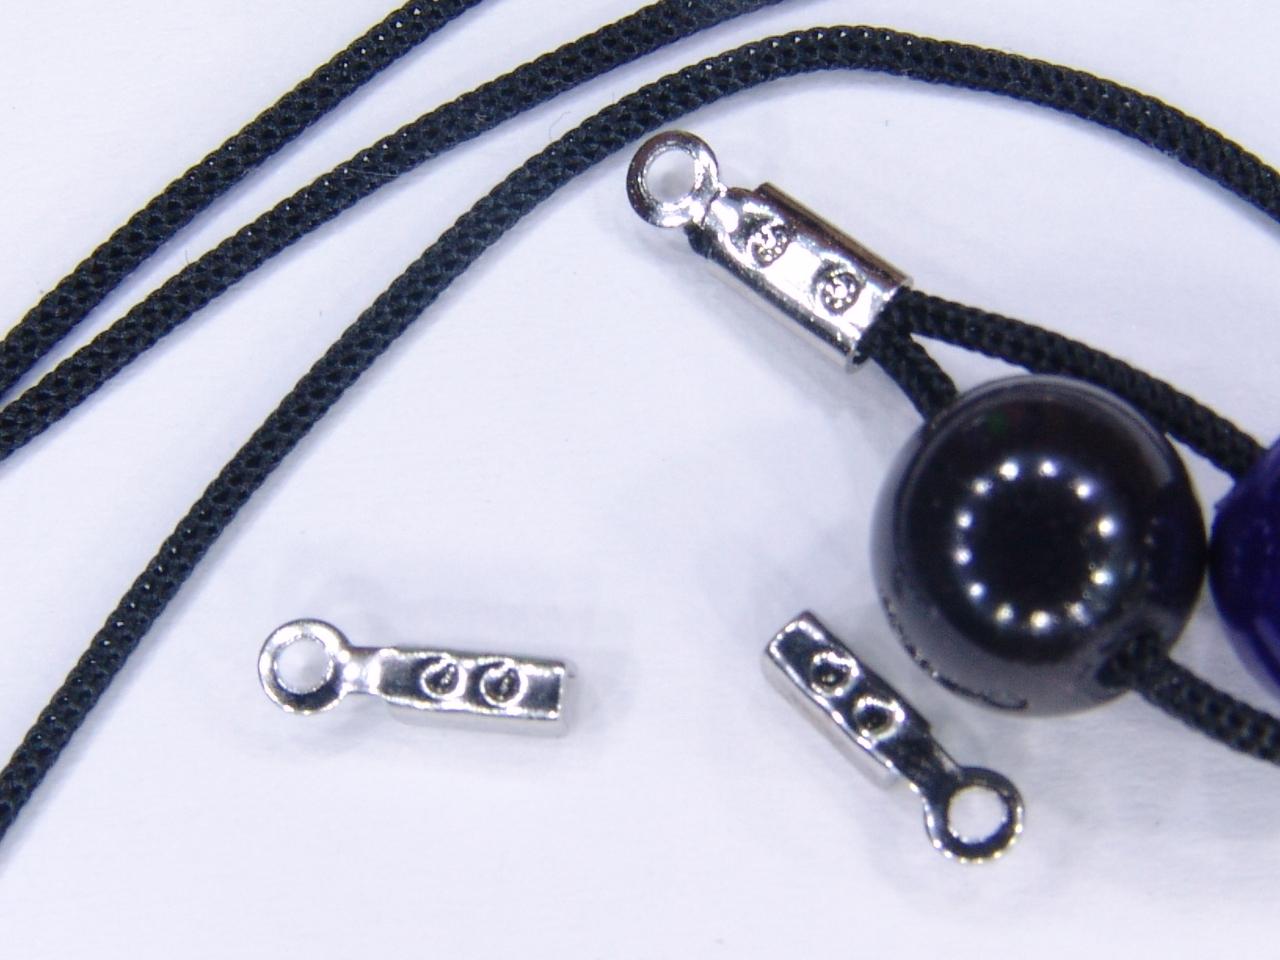 30 Quetschenden Endkappen z. Klemmen mini f.1mm Band /Draht kauf